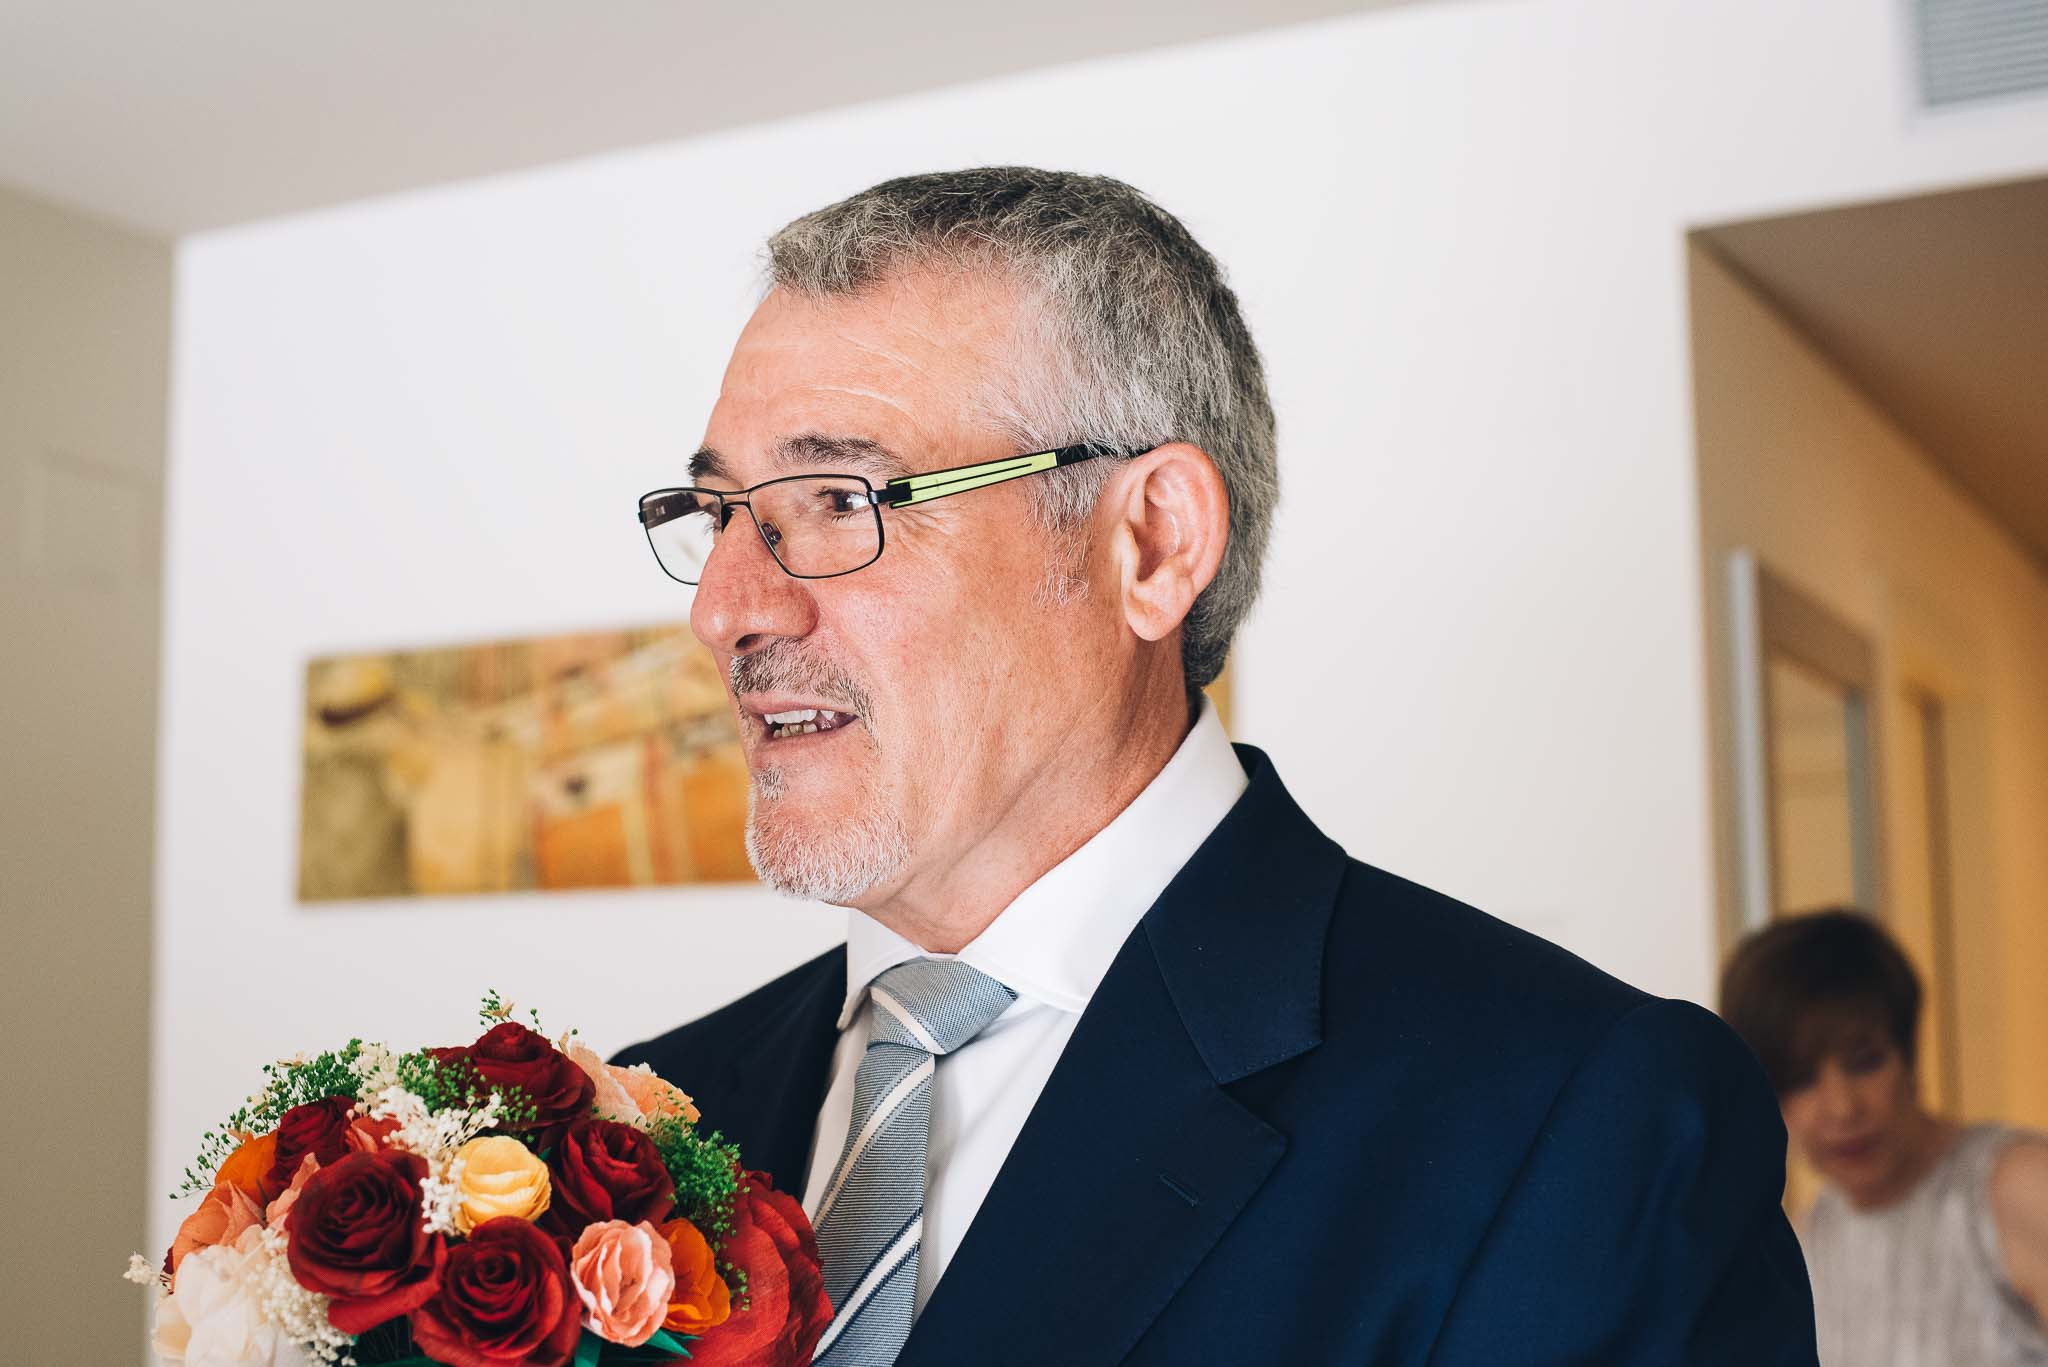 fotoperiodismo-laura-arroyo-fotografia-de-boda-hotel-qgat-san-cugat-barcelona-30